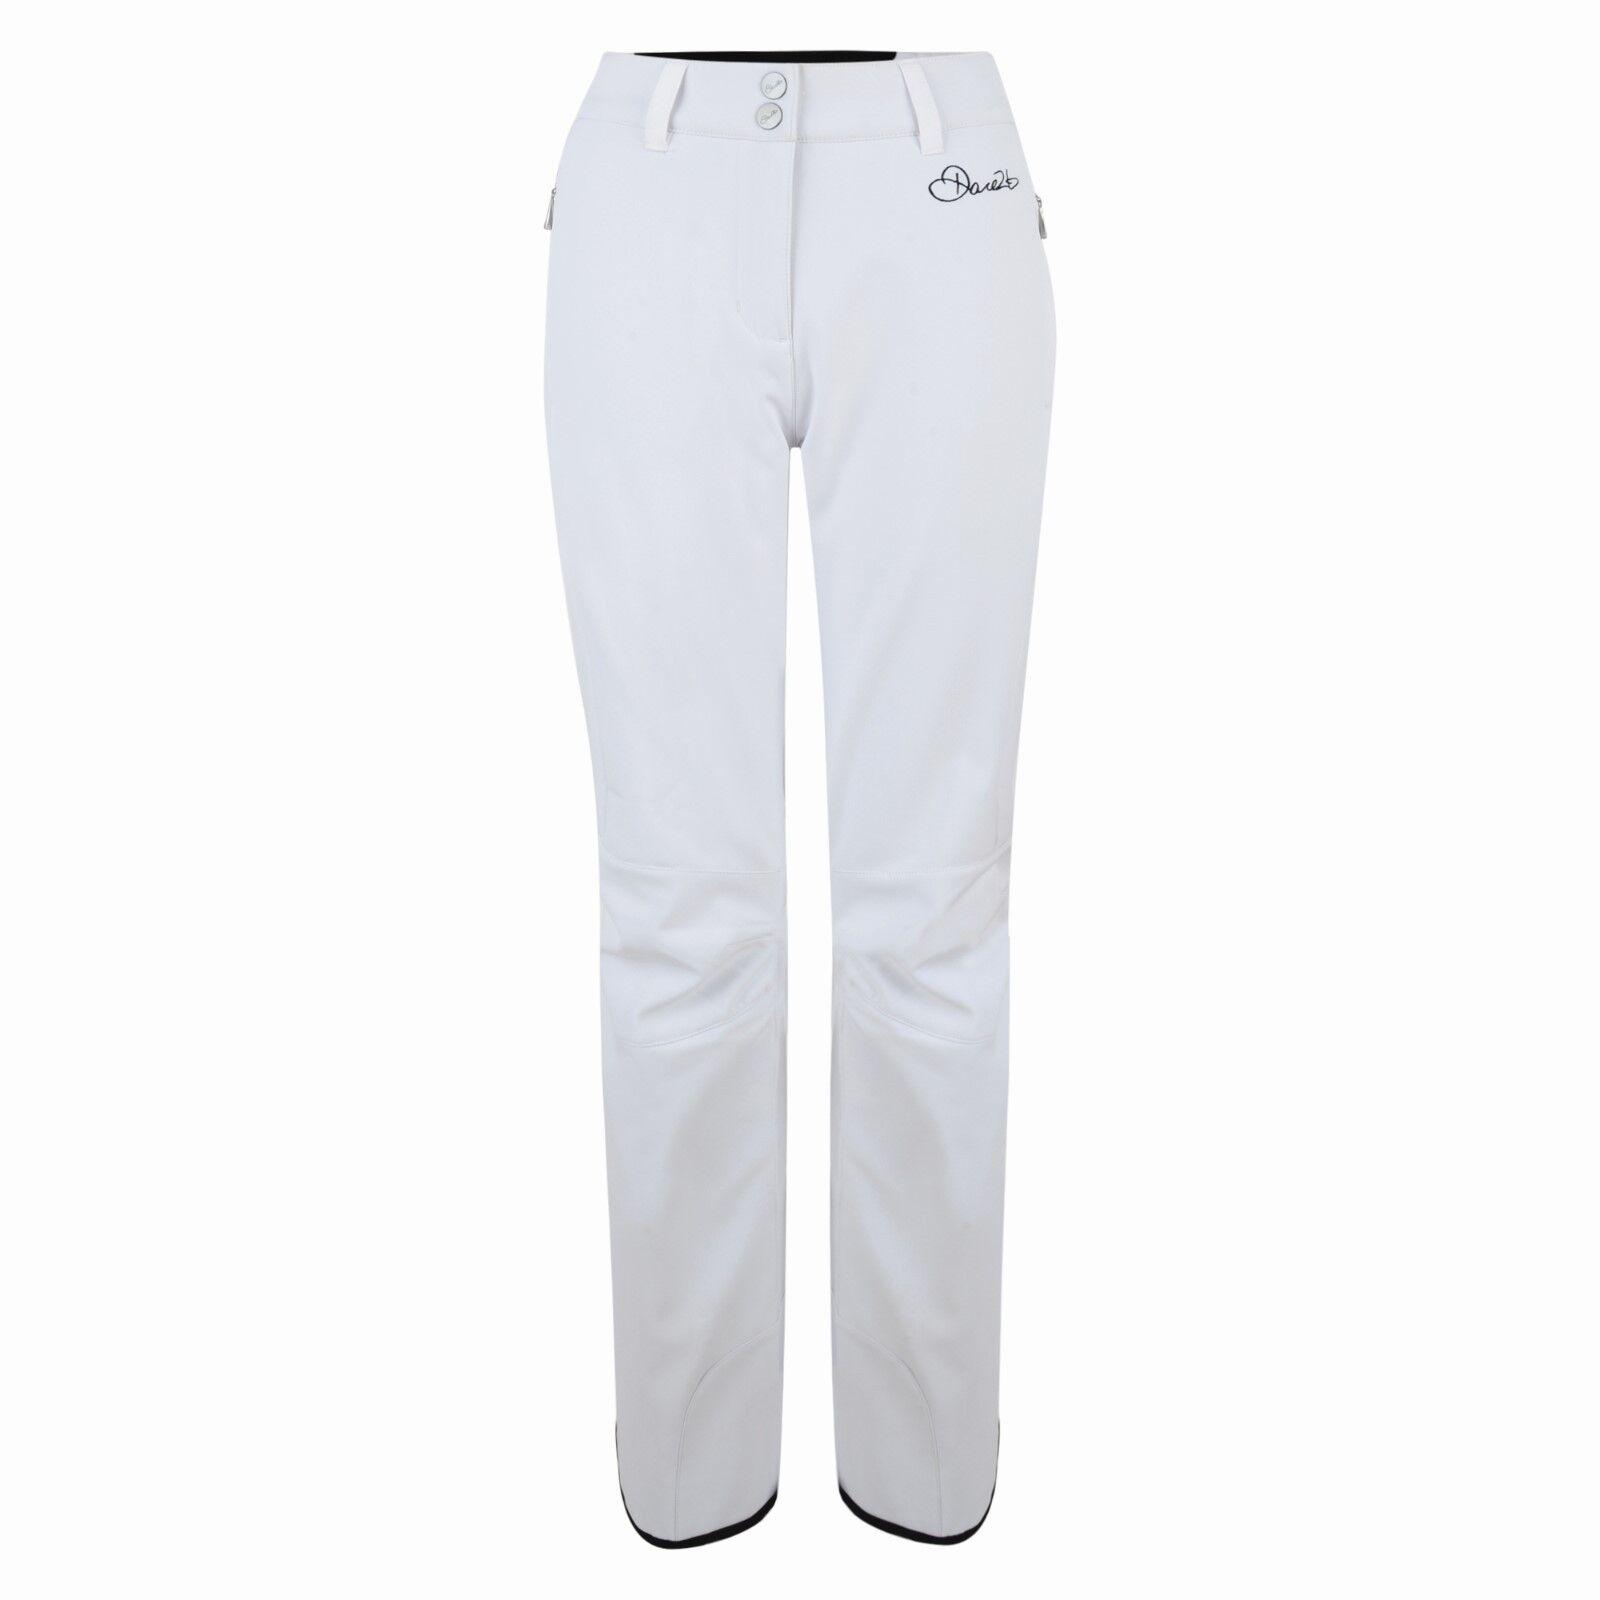 Dare 2b Ladies Remark Ski Pants Salopettes 10,000mm Waterproof White Size 14